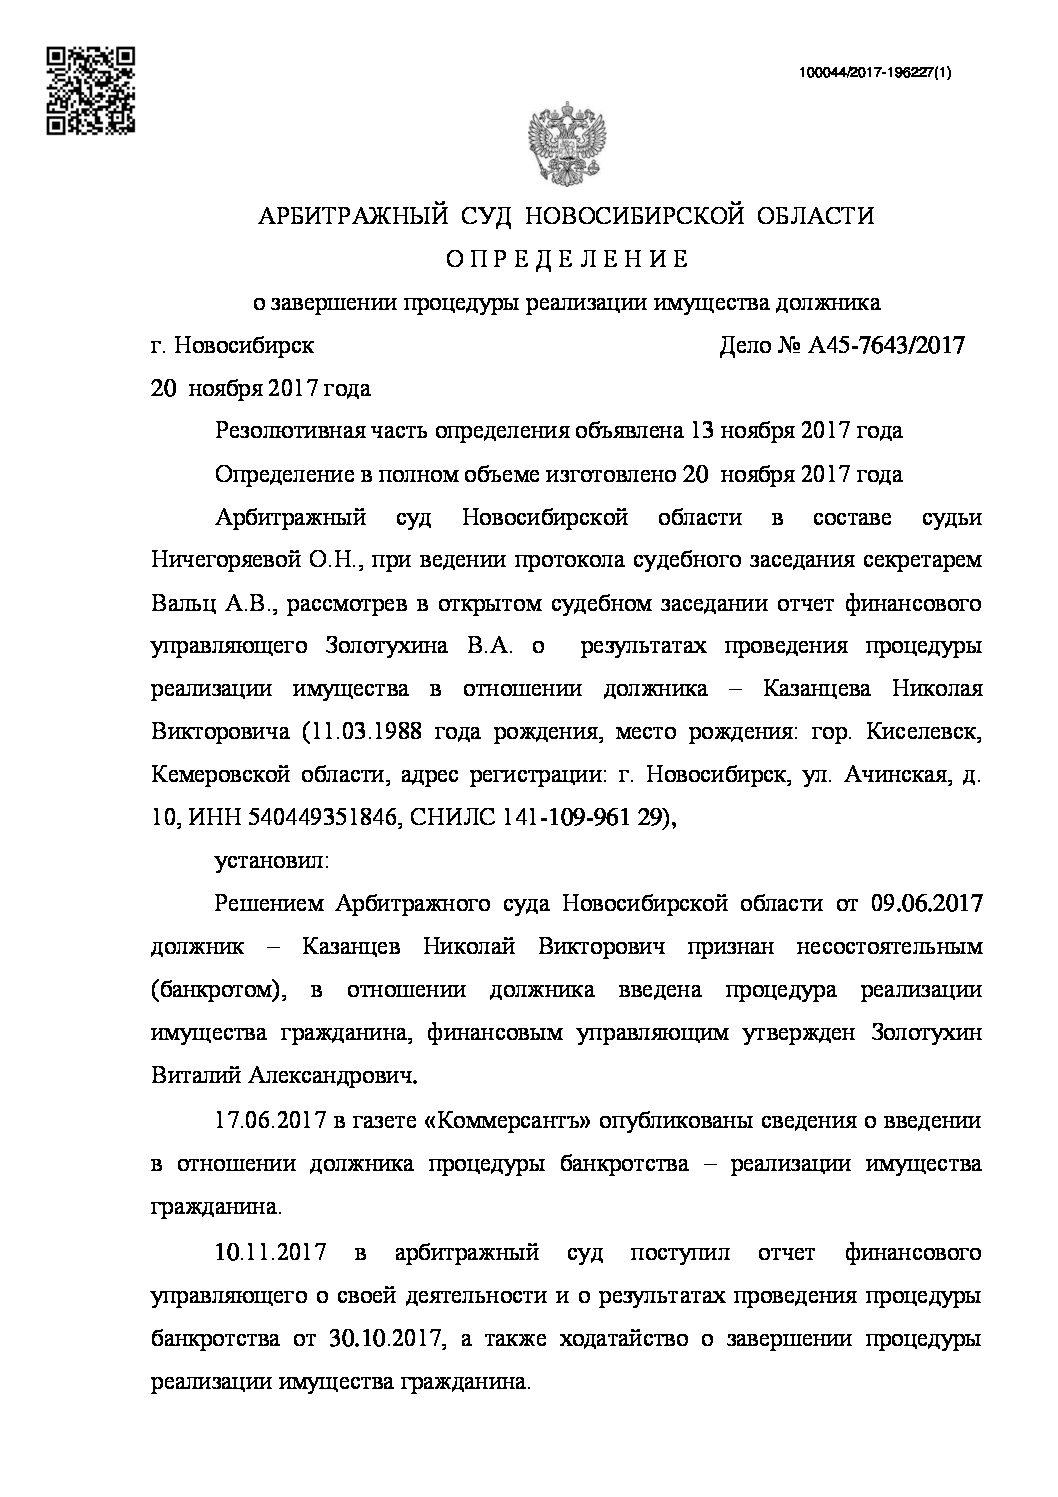 А45-7643-2017_20171120